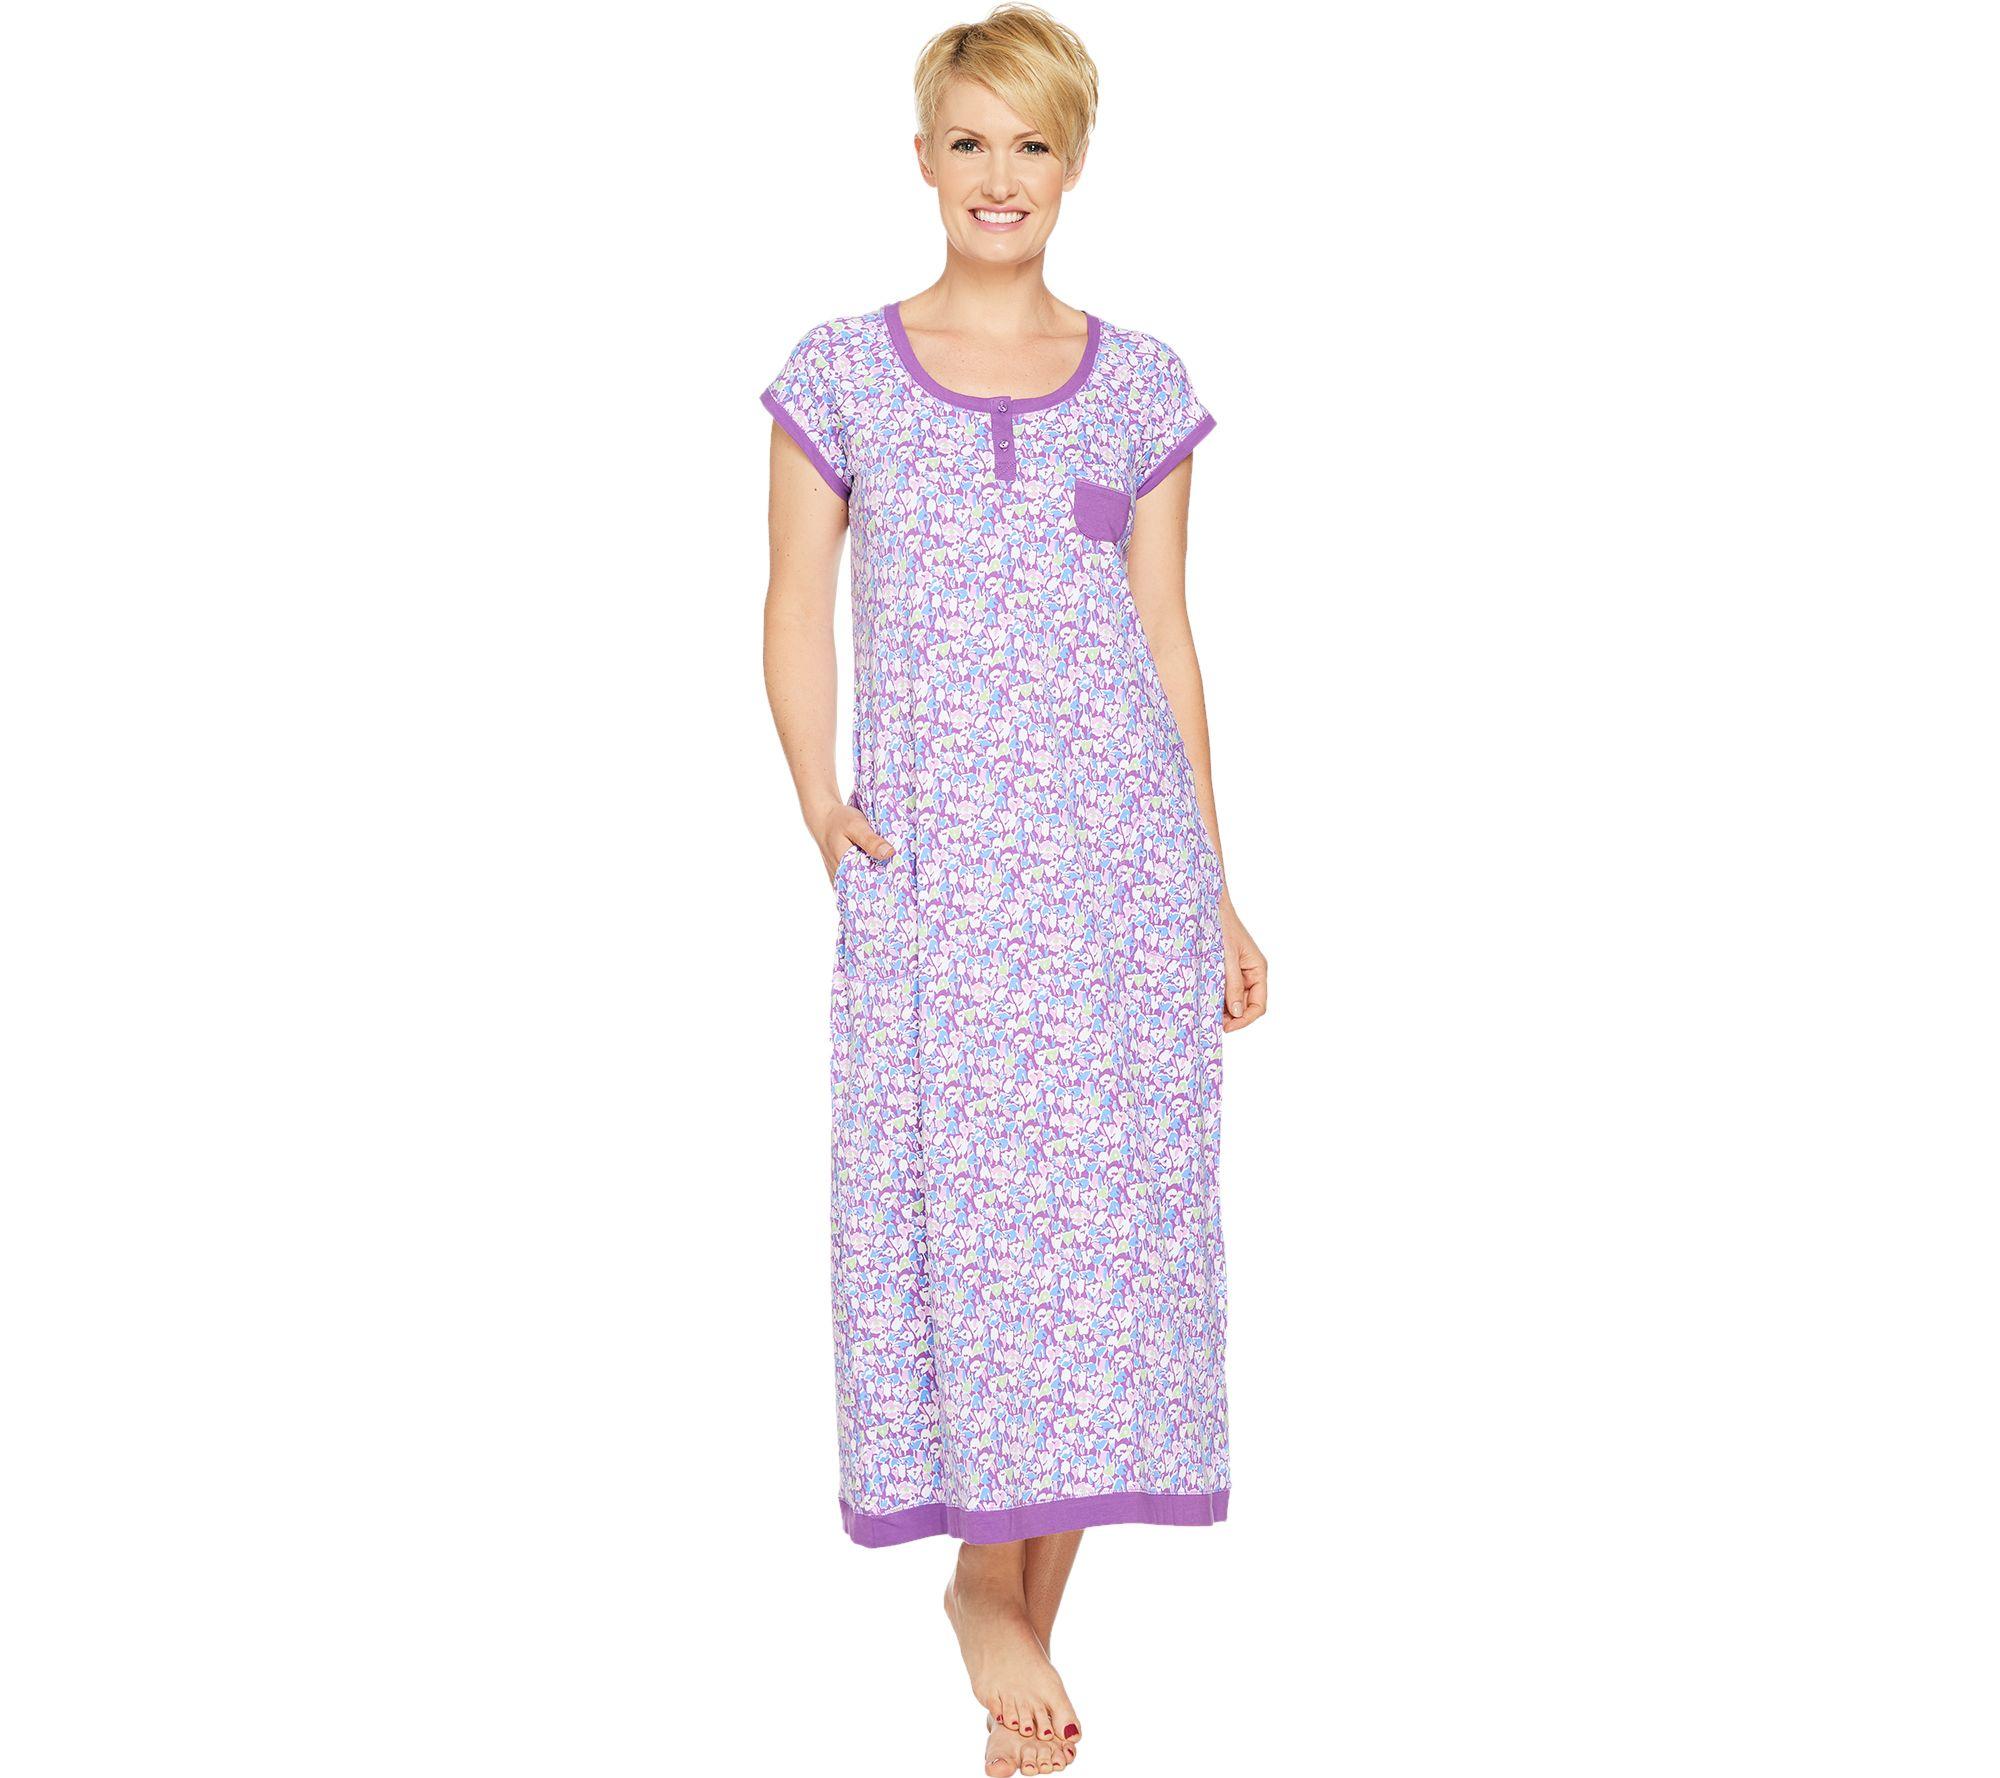 Carole Hochman Ditsy Field Cotton Knit Long Gown - Page 1 — QVC.com